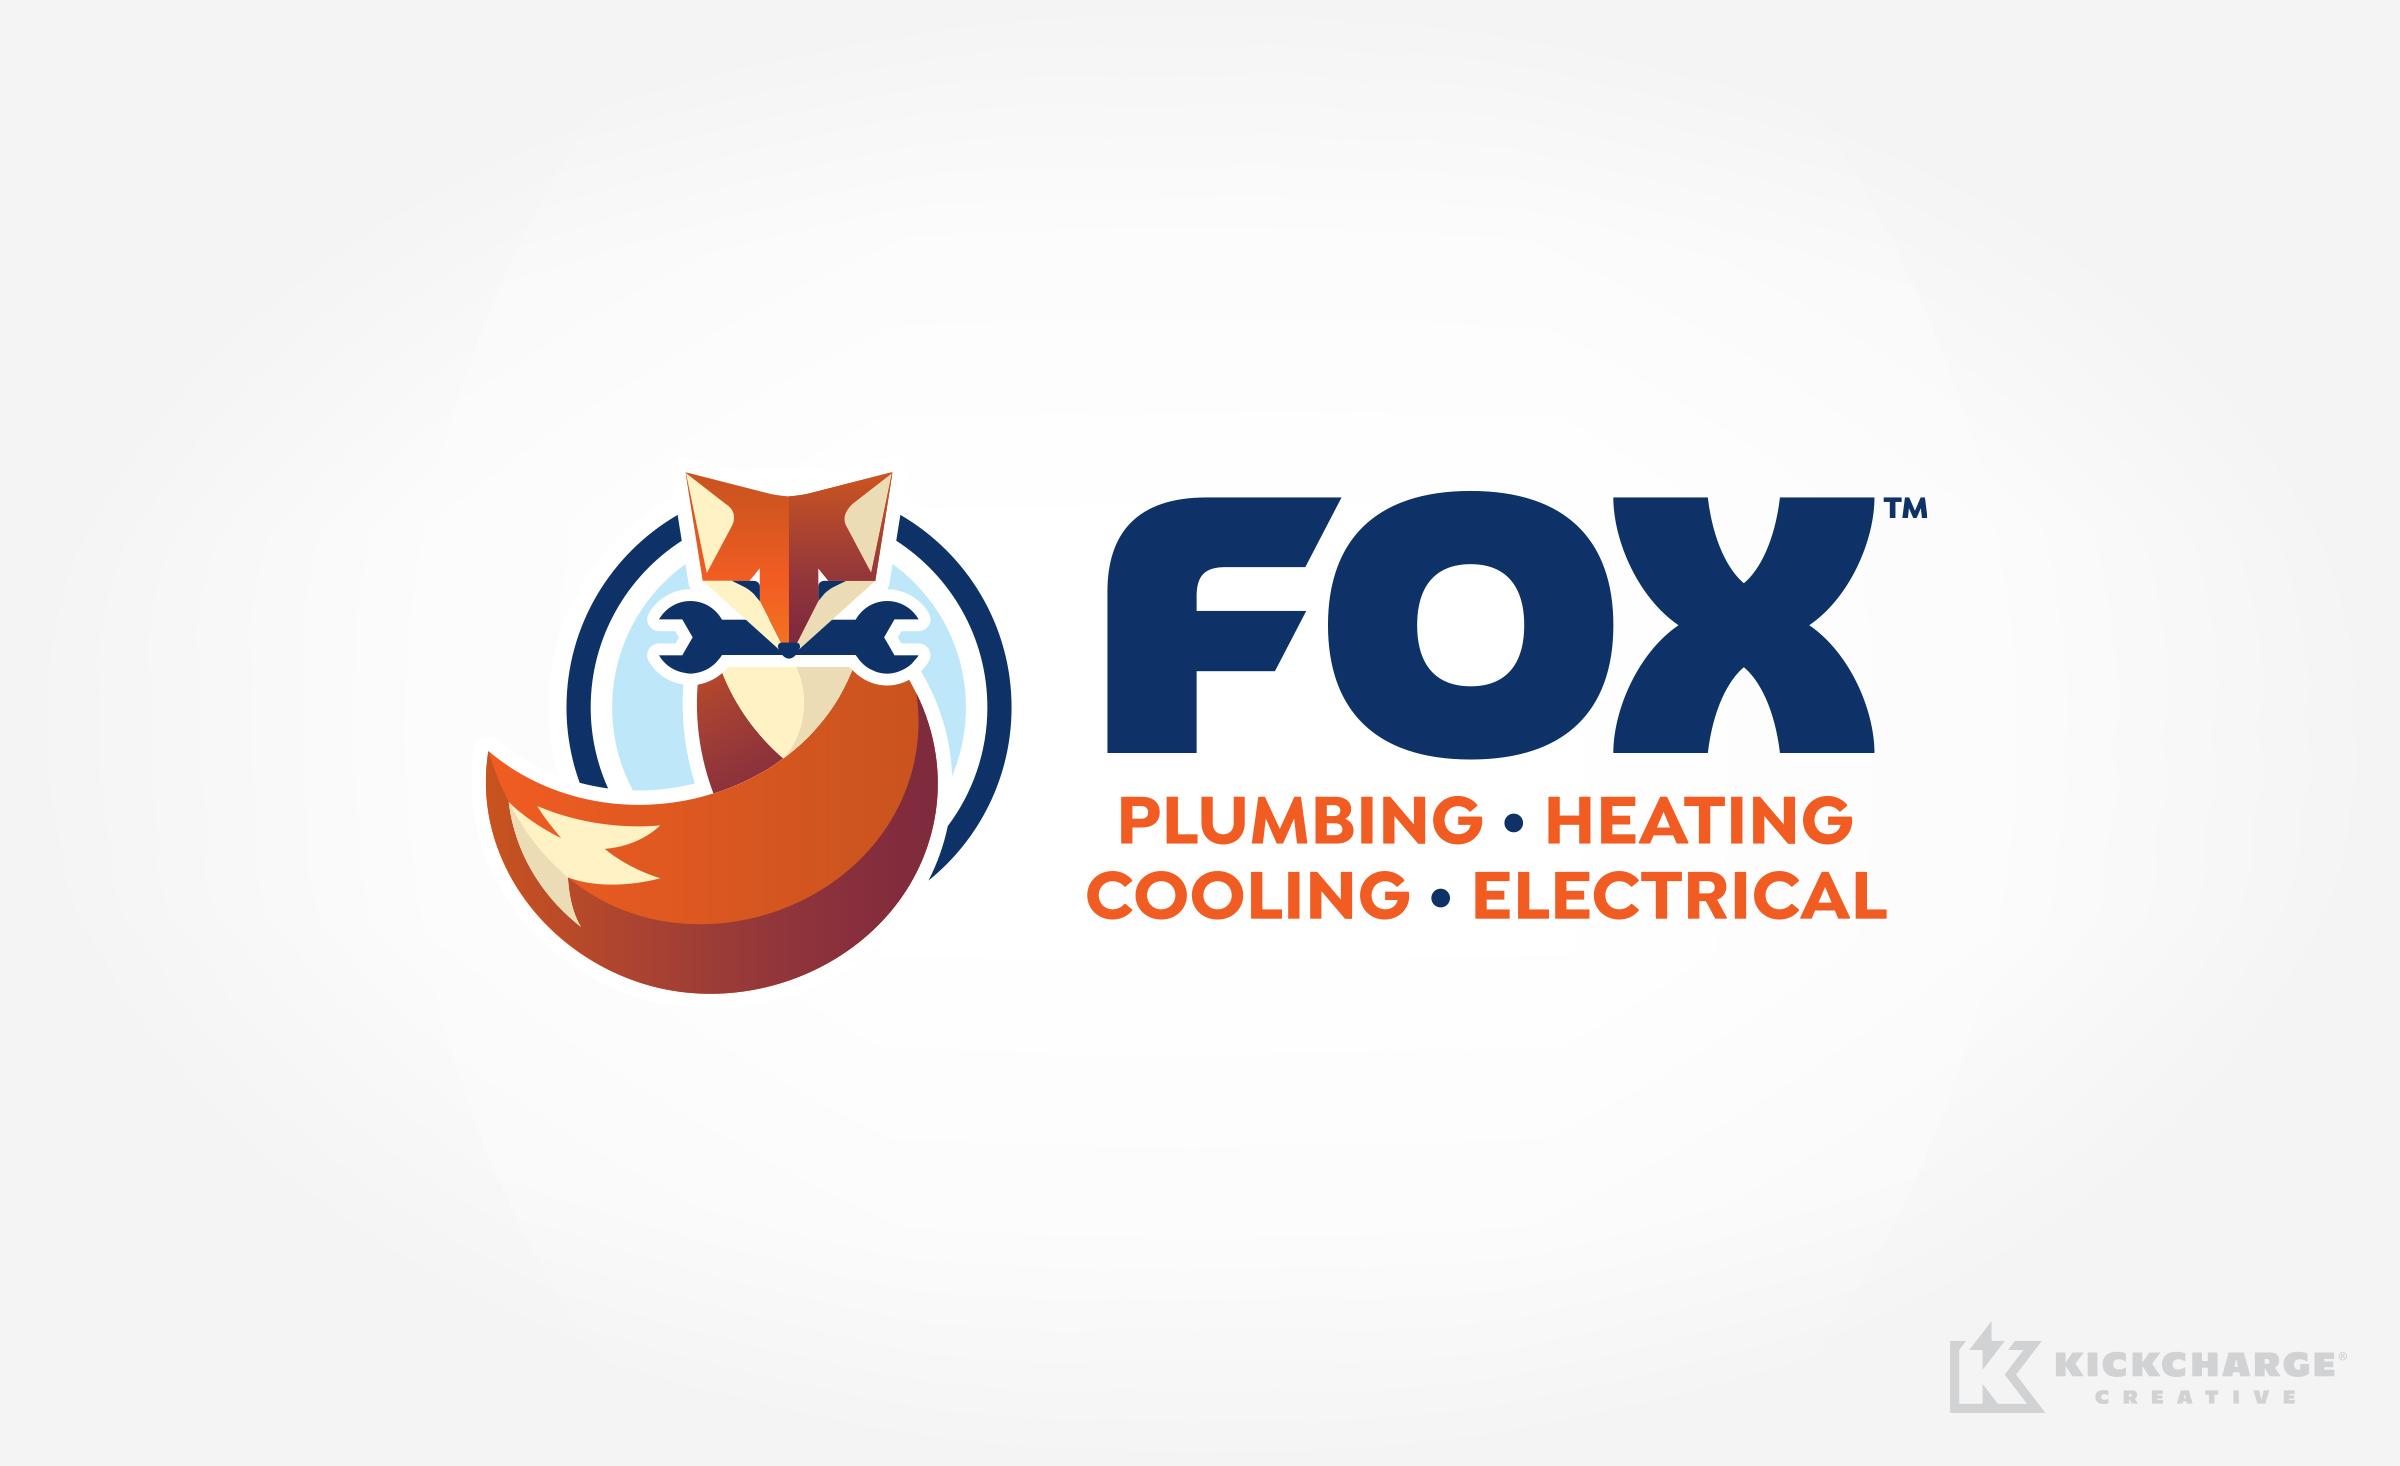 plumbing and hvac logo for Fox